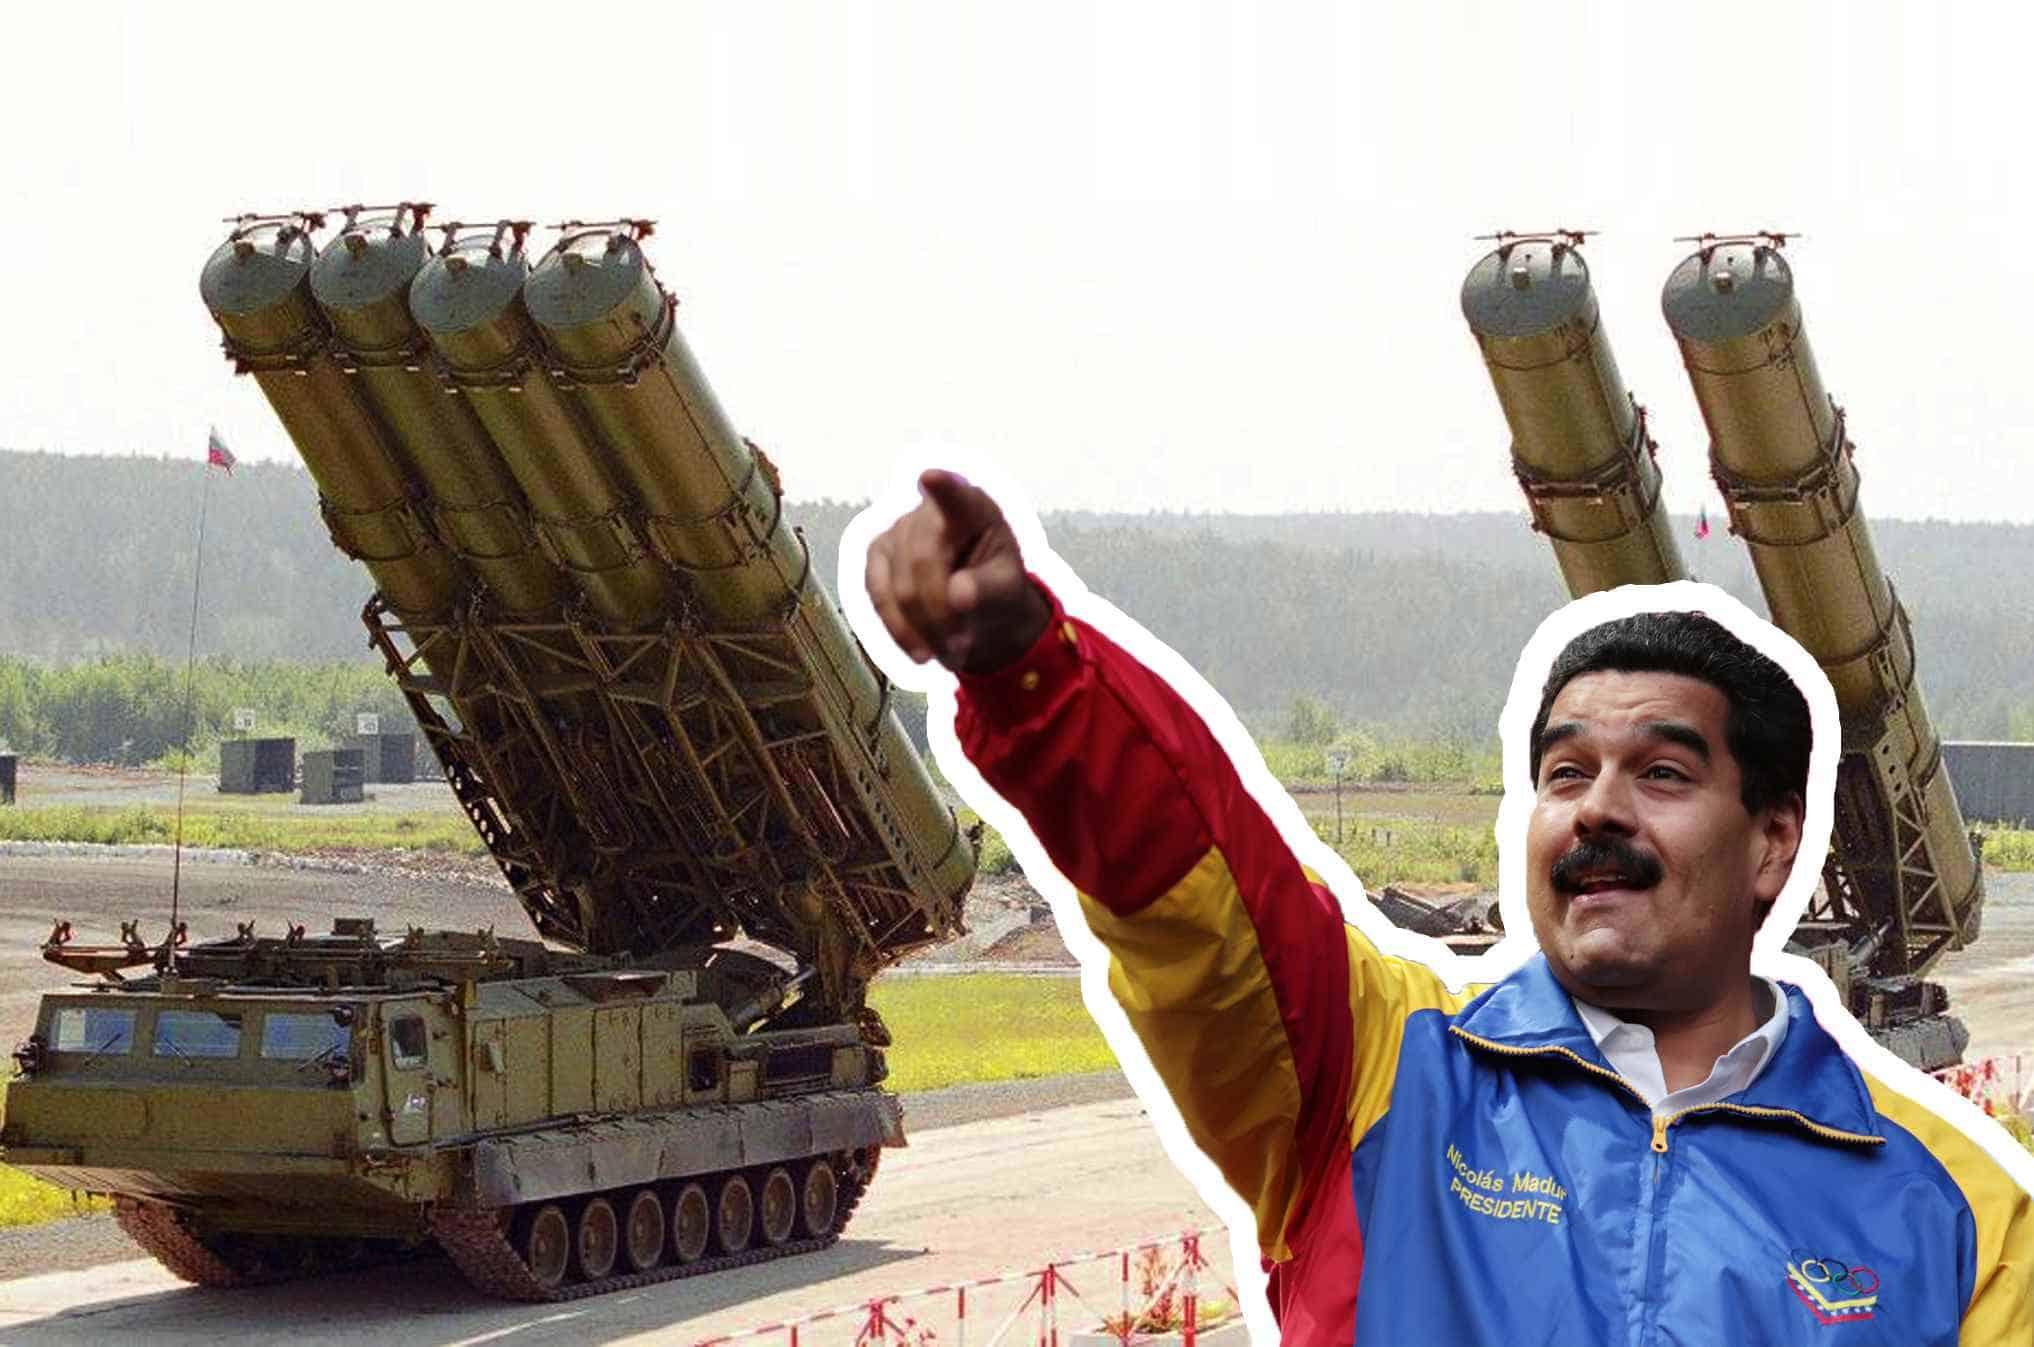 Mitzy Capriles de Ledezma: ¡A comer misiles!